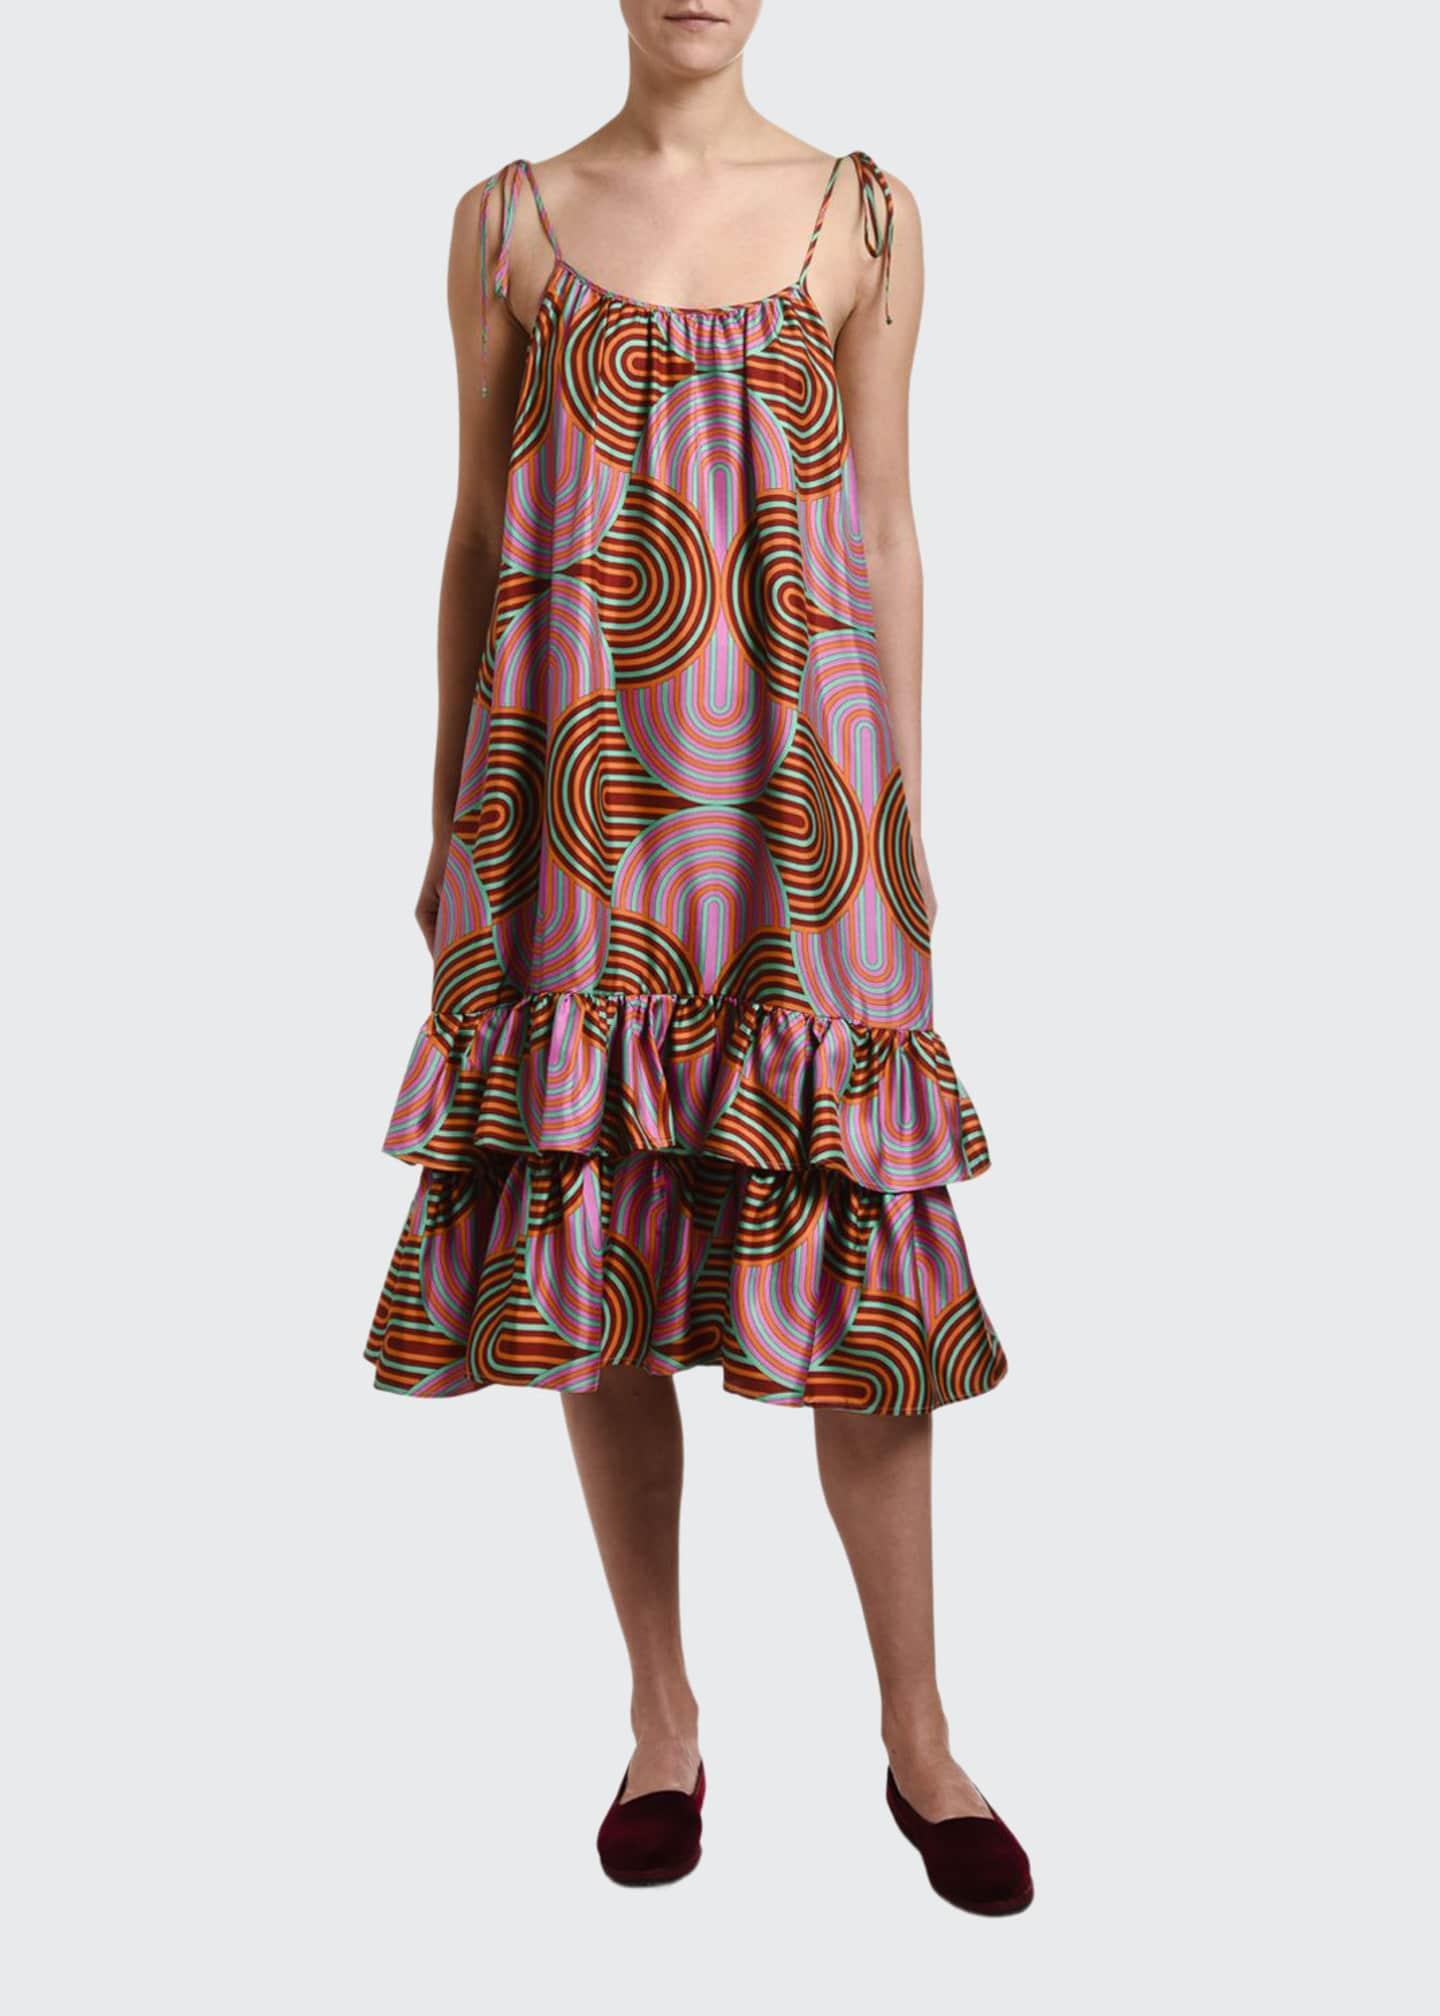 Double J Tie-Shoulder Slinky-Print Bouncy Dress